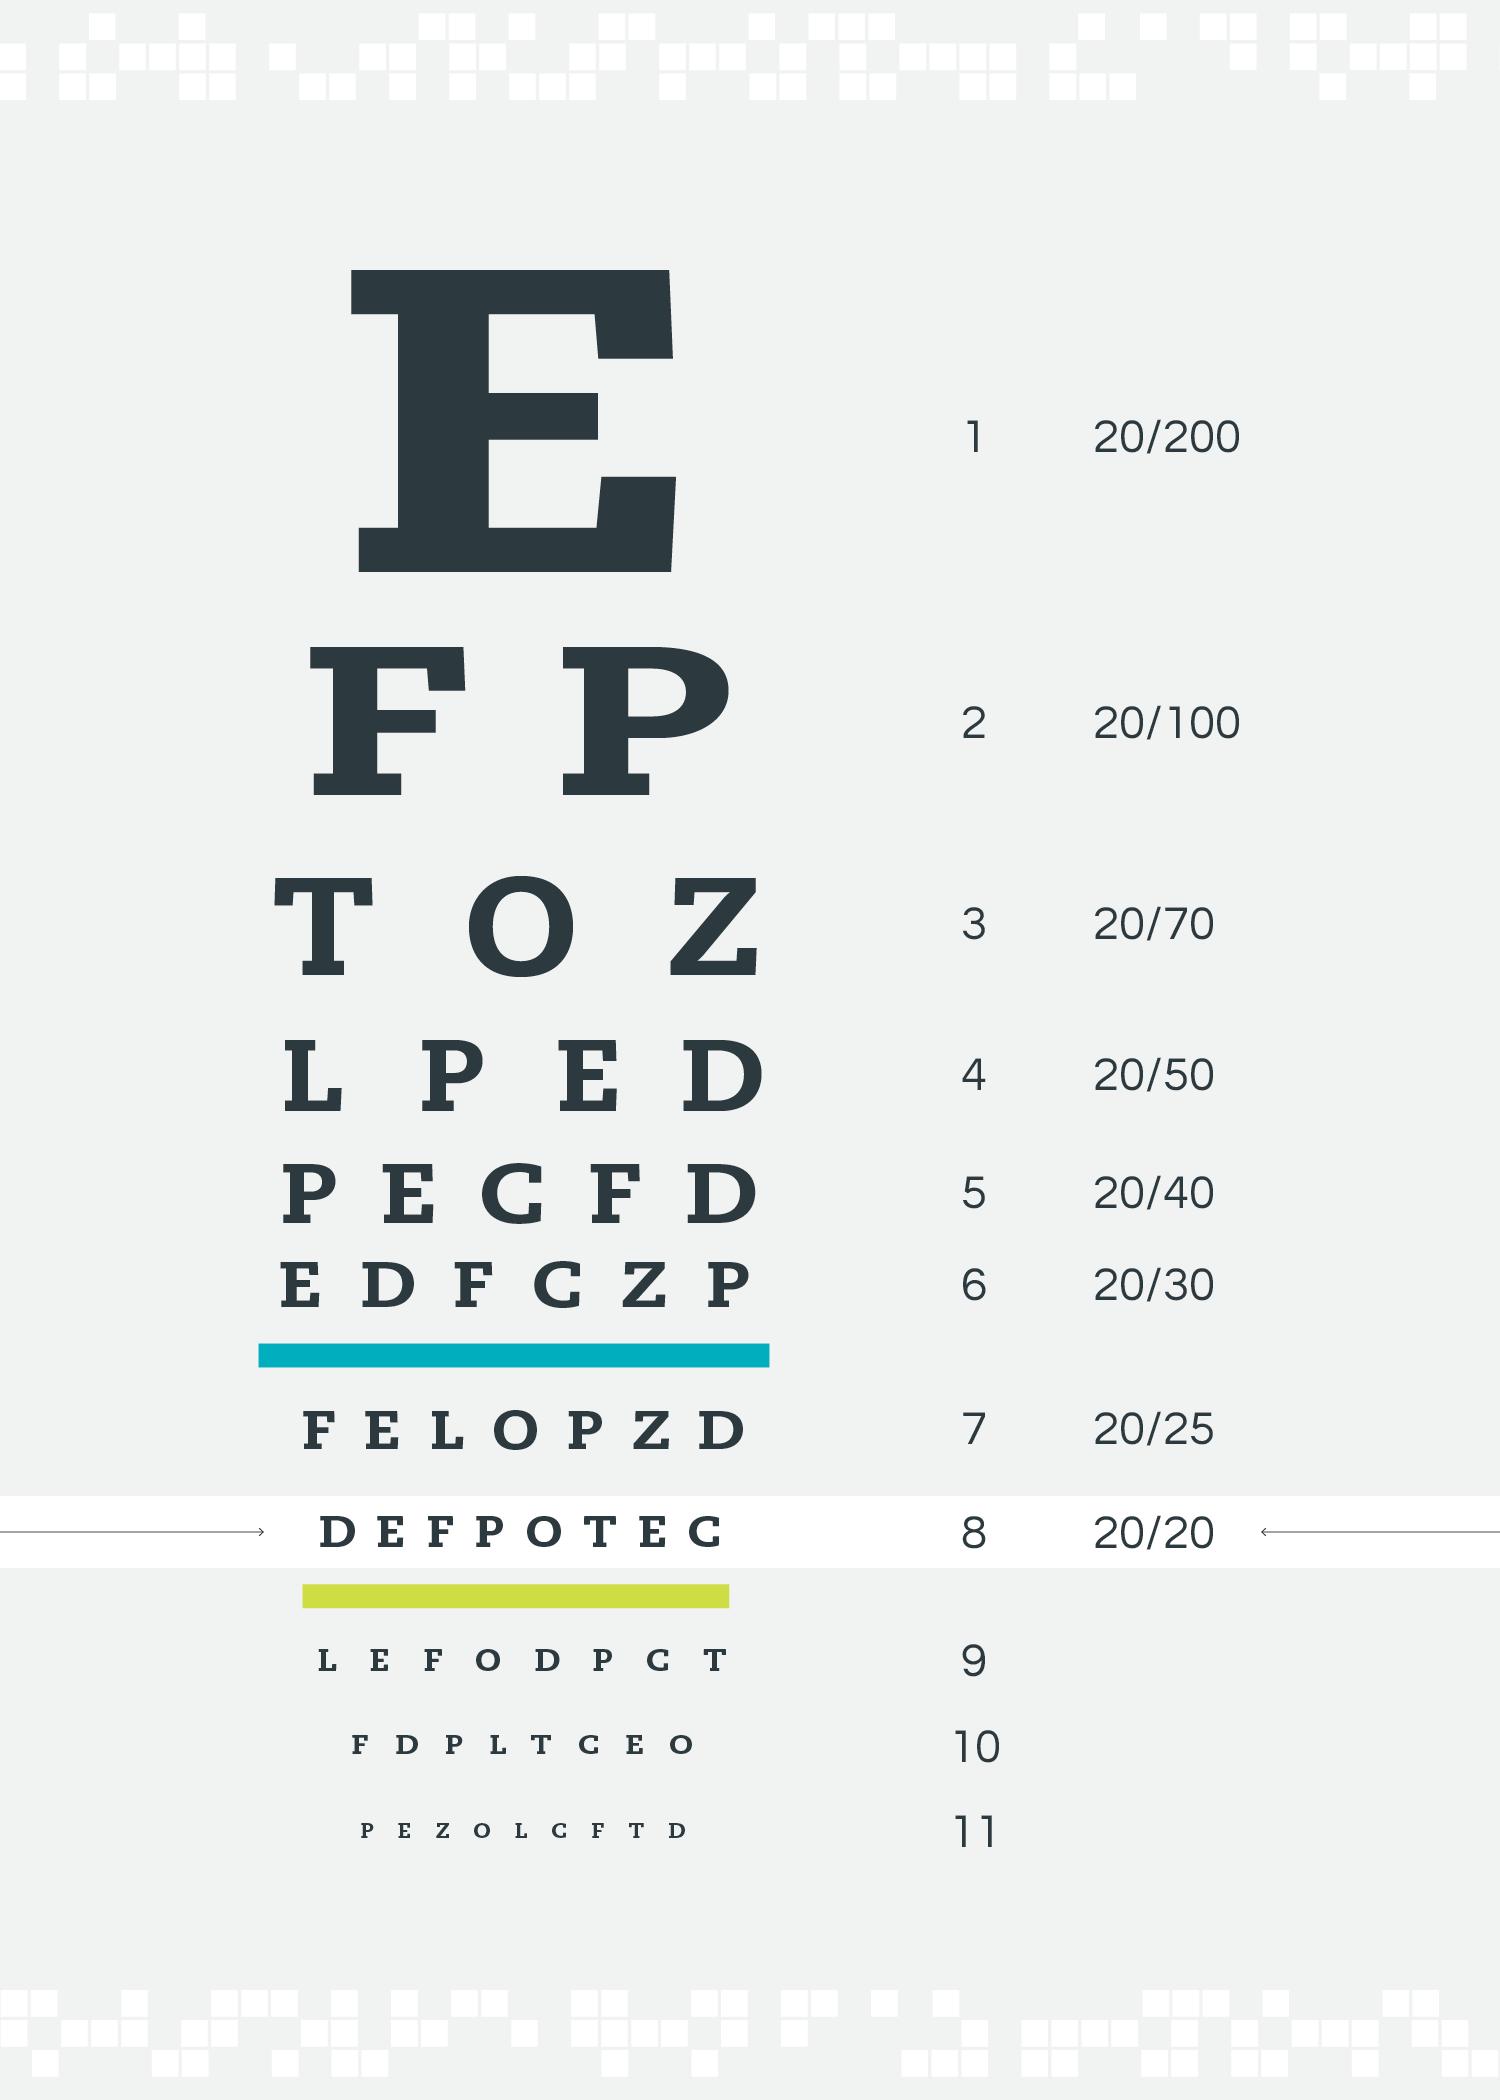 cheyenne eye clinic 2020 vision